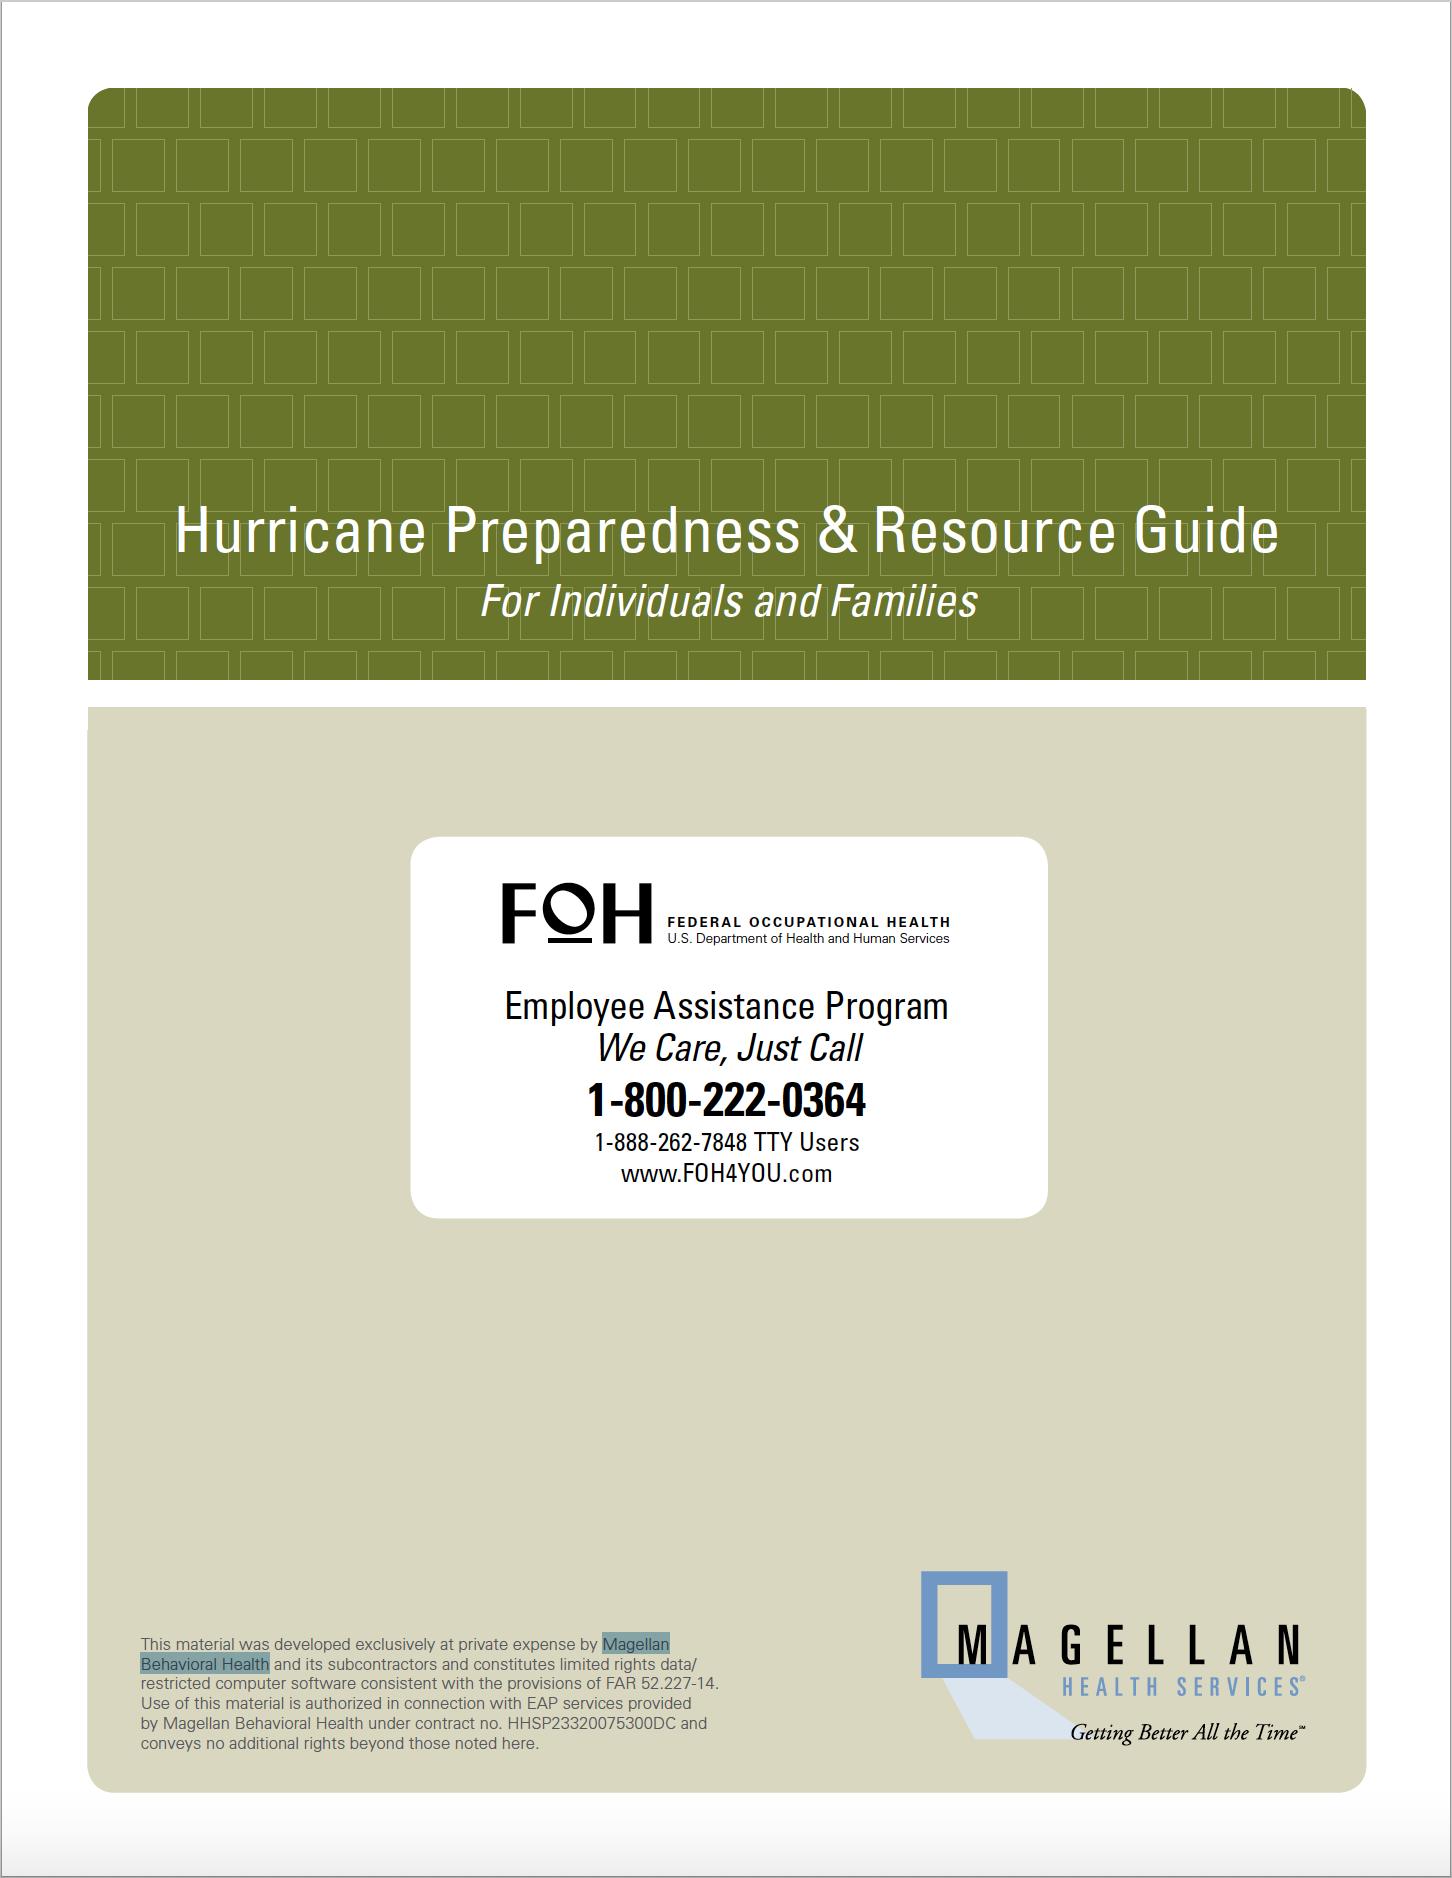 Hurricane Preparedness & Resource Guide from Magellan Behavioral Health